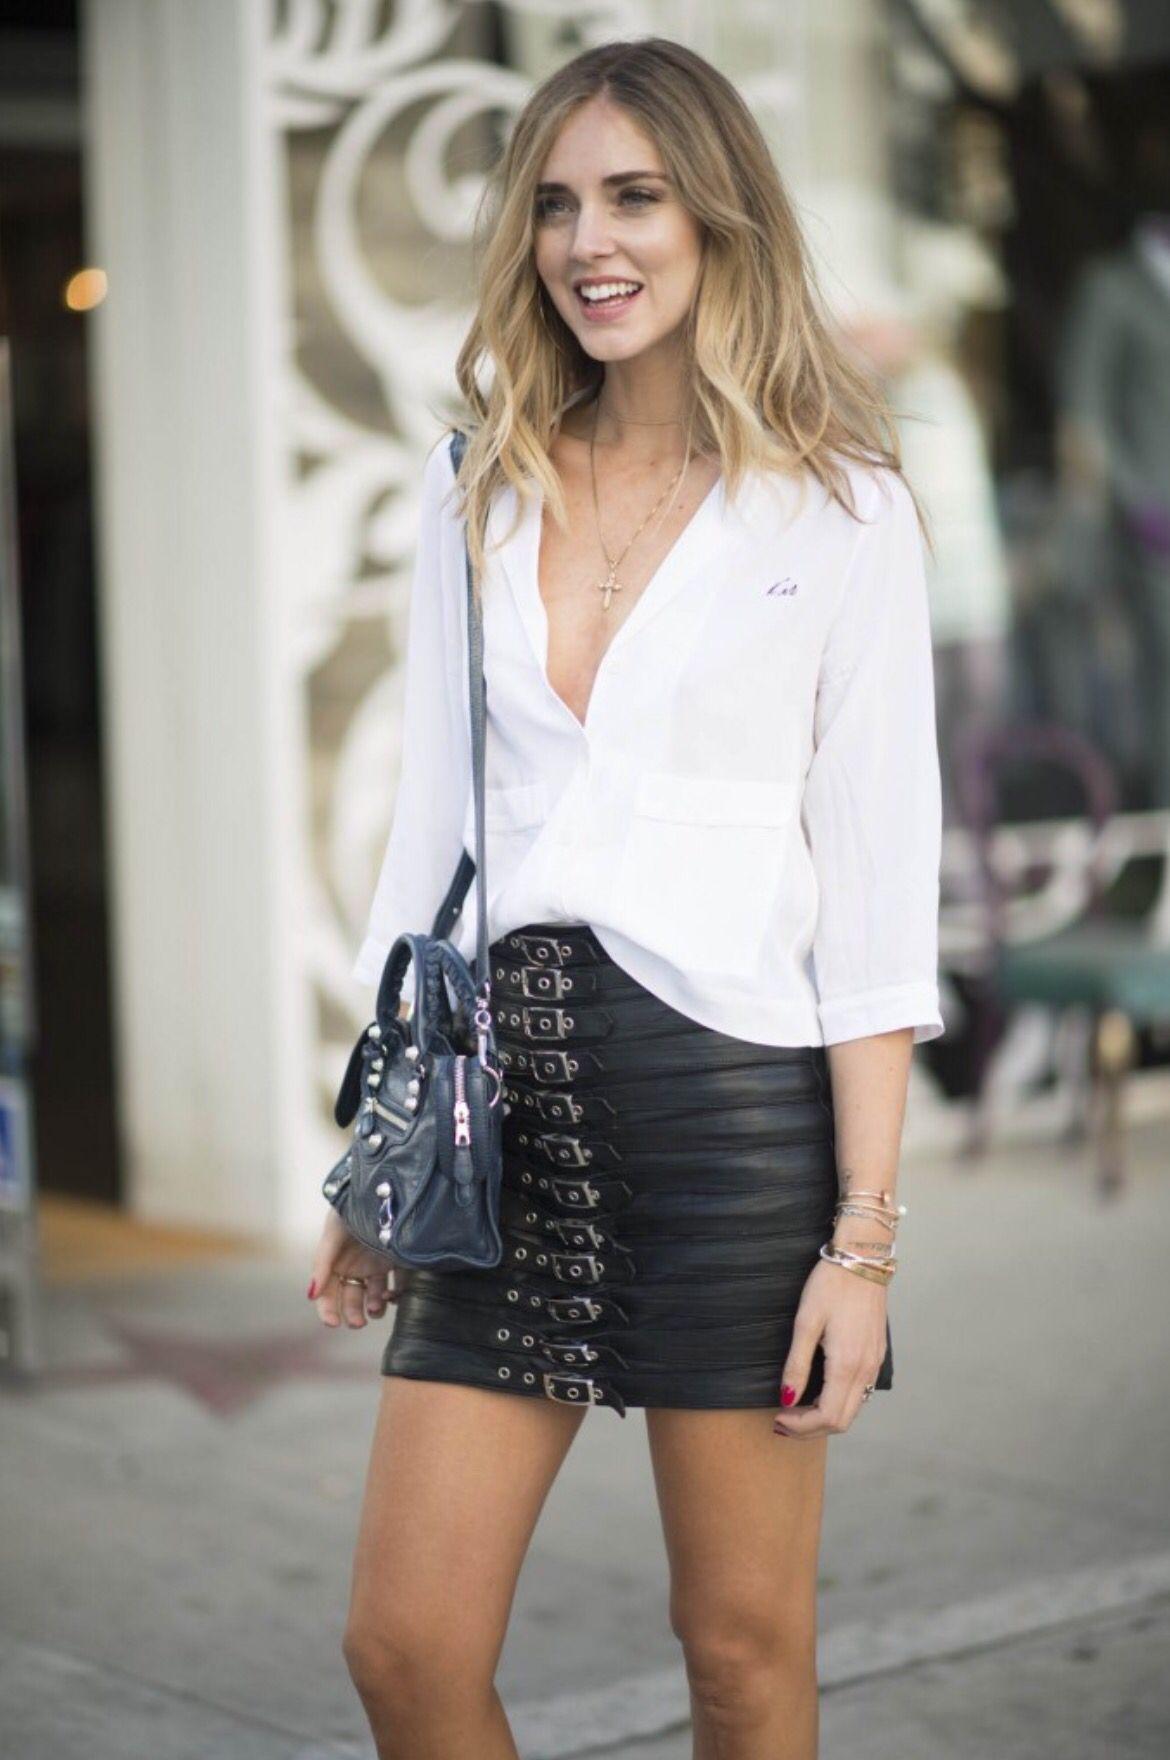 7ae5d253ff Gorgeous Chiara Ferragni wearing our black leather skirt  Chiara   ChiaraFerragni  Blogger  Blog  Fashion  Style  Trends  Leather   LeatherSkirt  Skirt